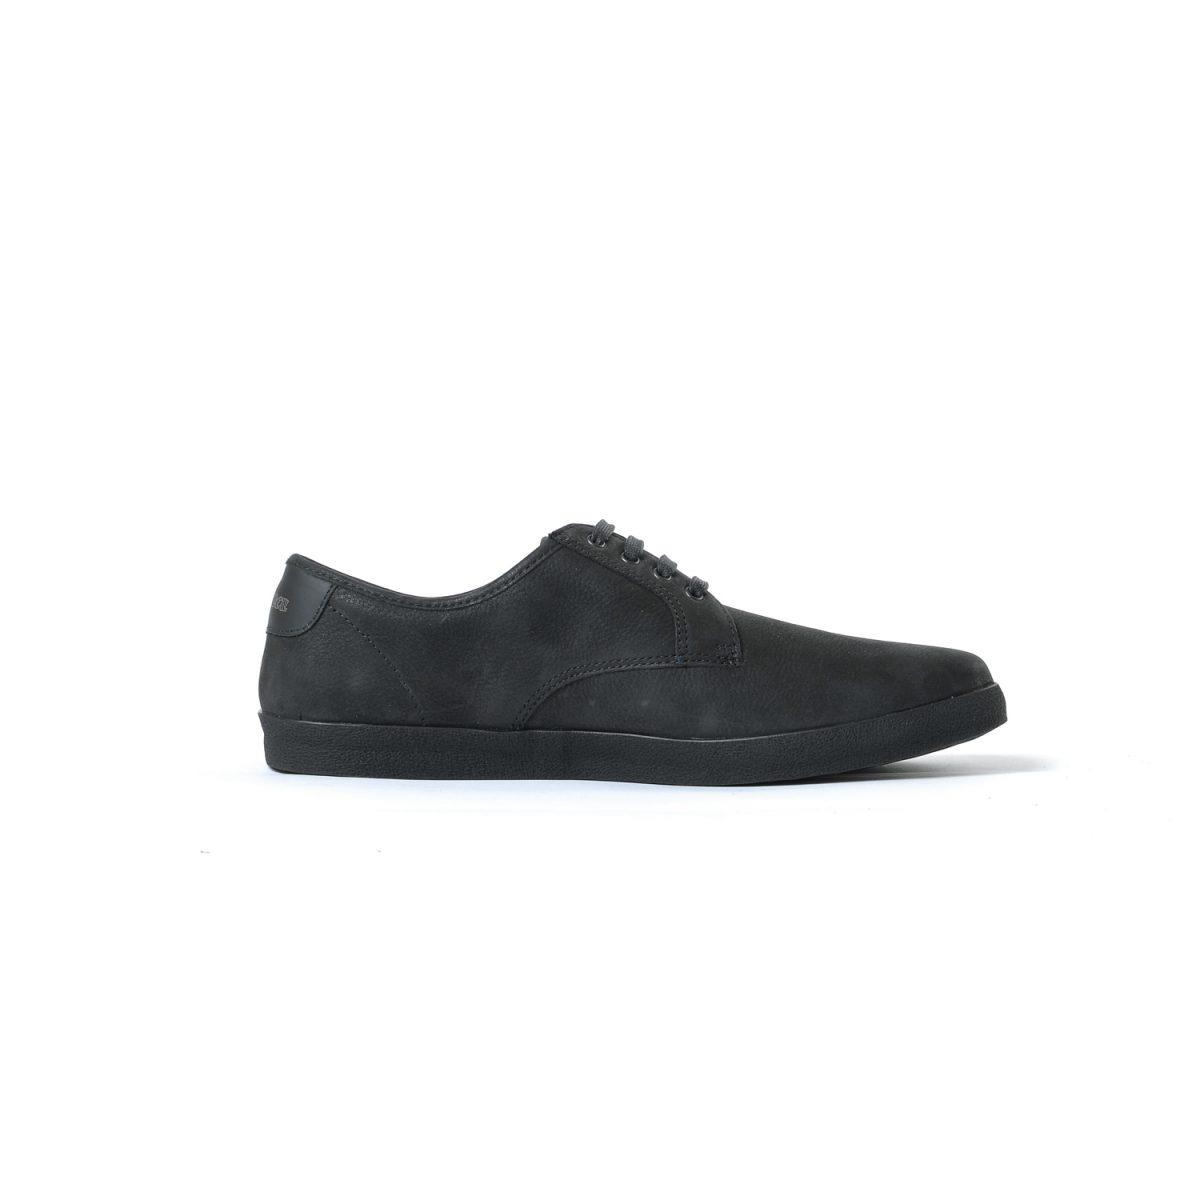 Tisza shoes - City - Black